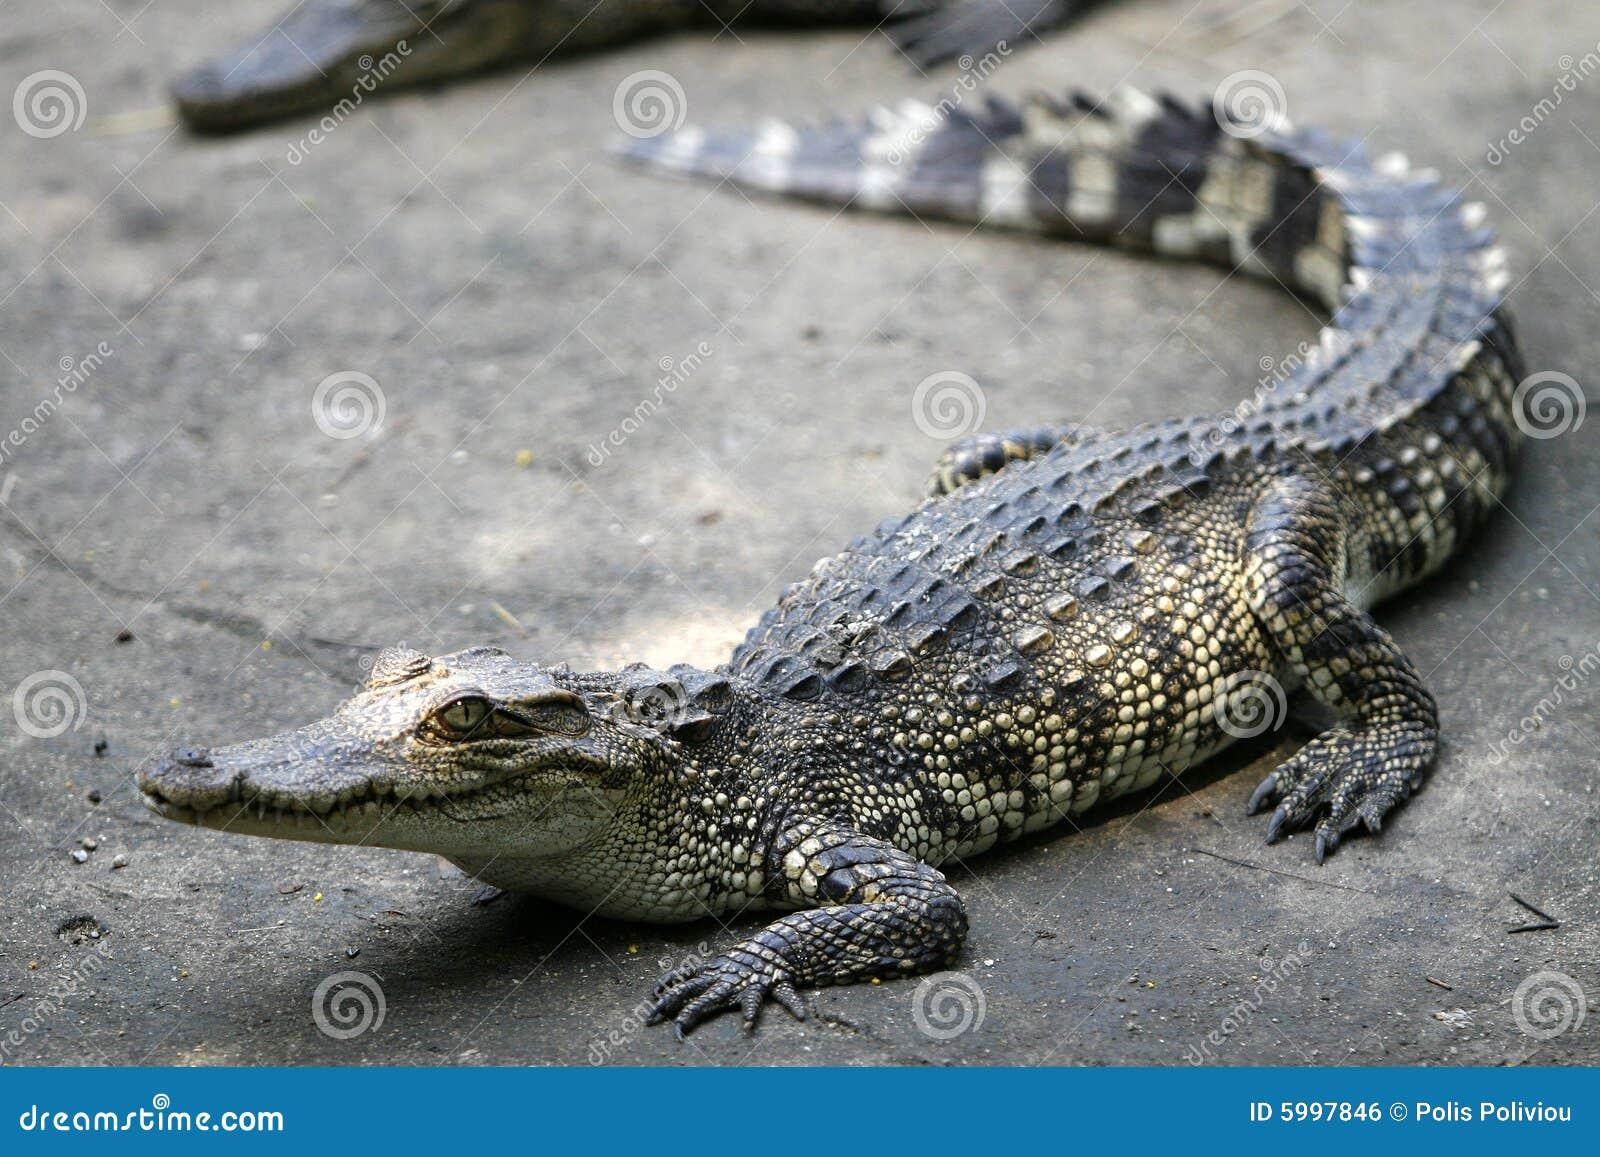 baby crocodile stock photo image of dangerous asia land 5997846